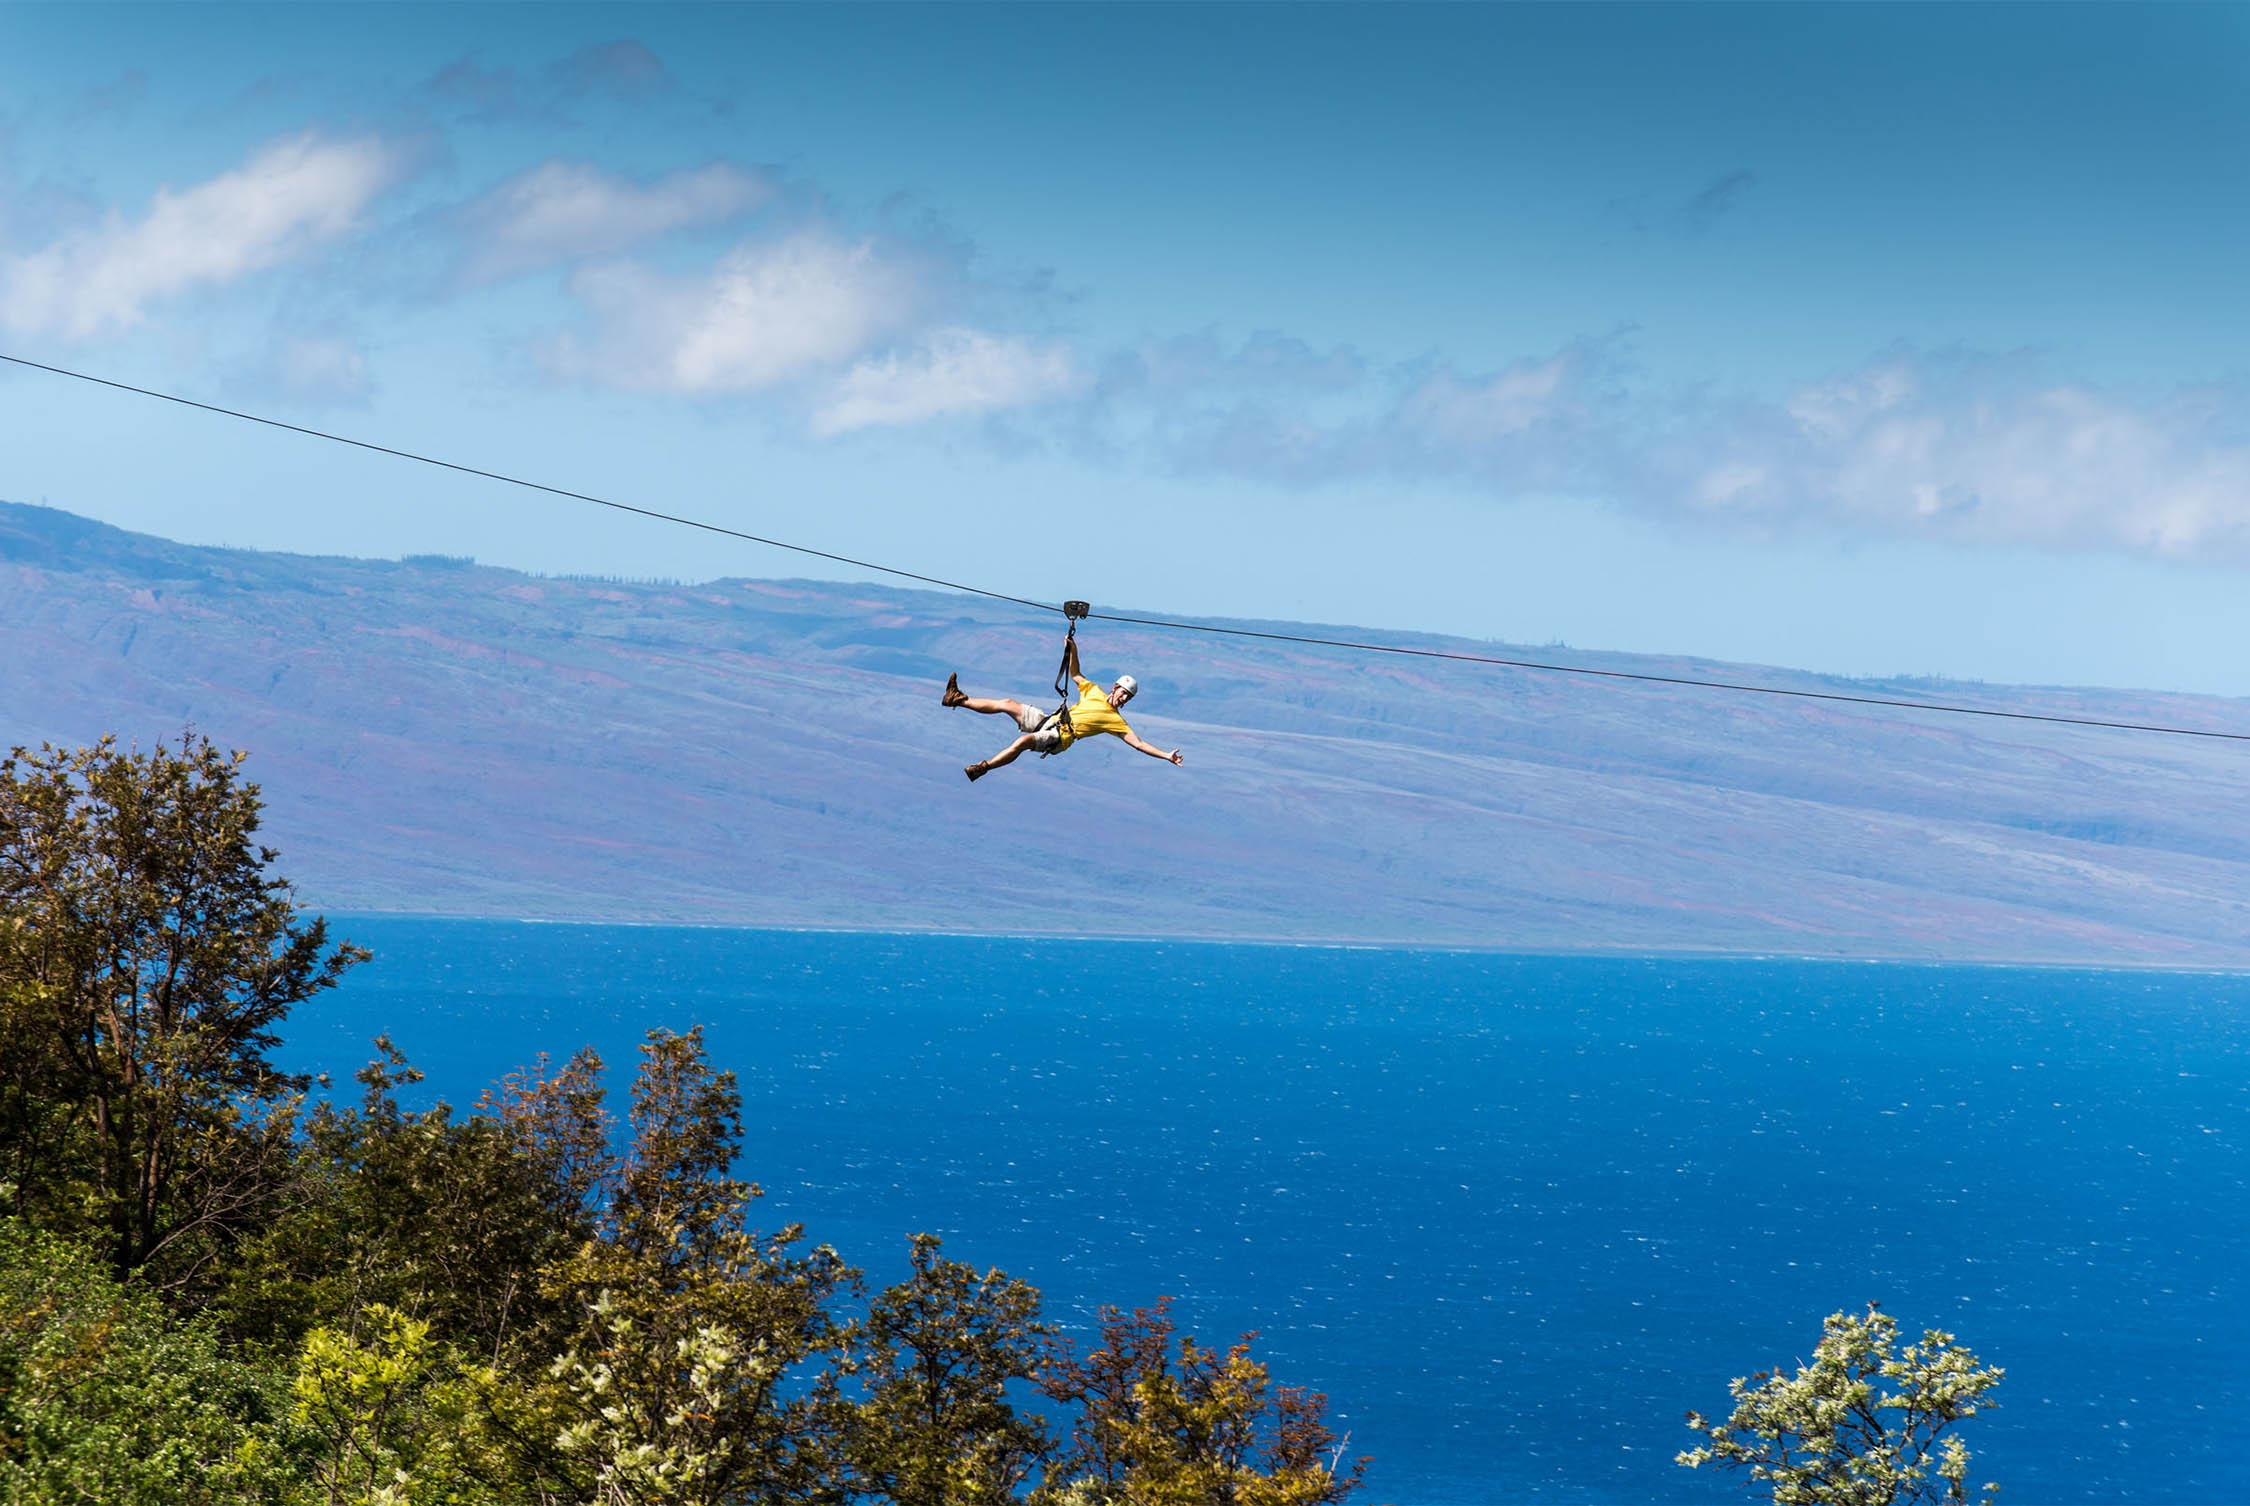 kaanapali maui zipline - #1 zipline tour | skyline eco-adventures